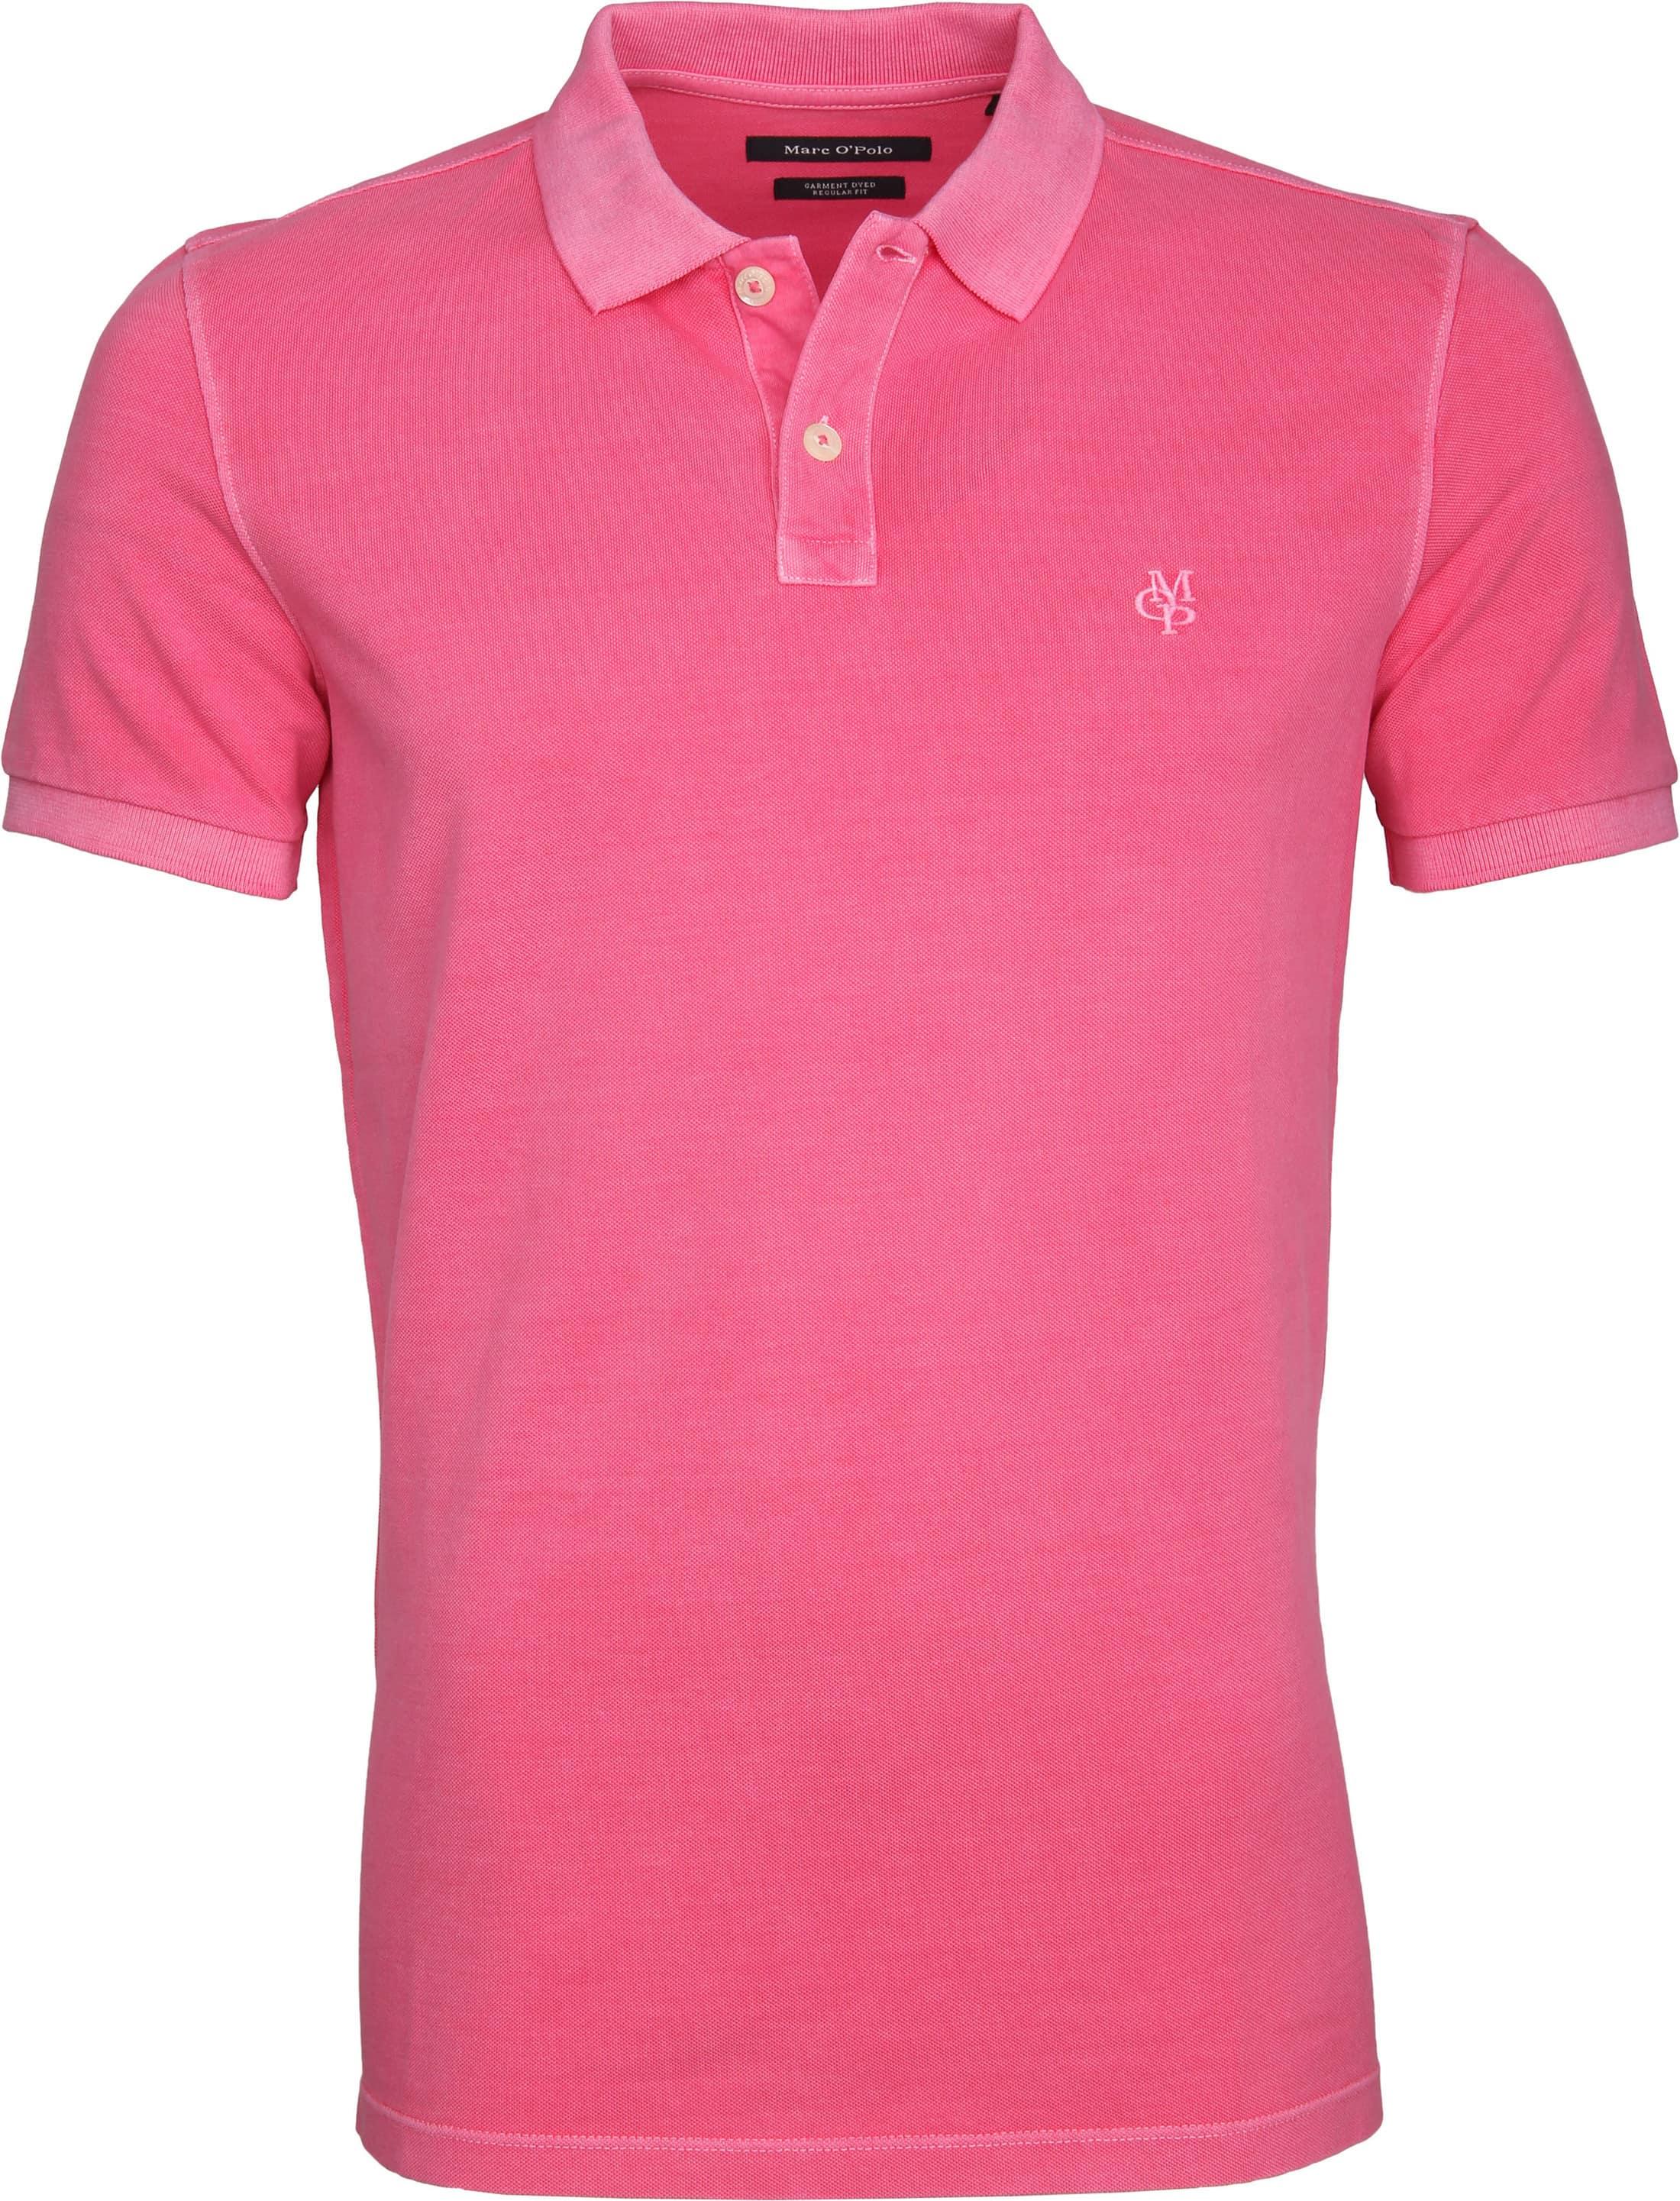 Marc O'Polo Poloshirt Garment Dyed Rosa foto 0